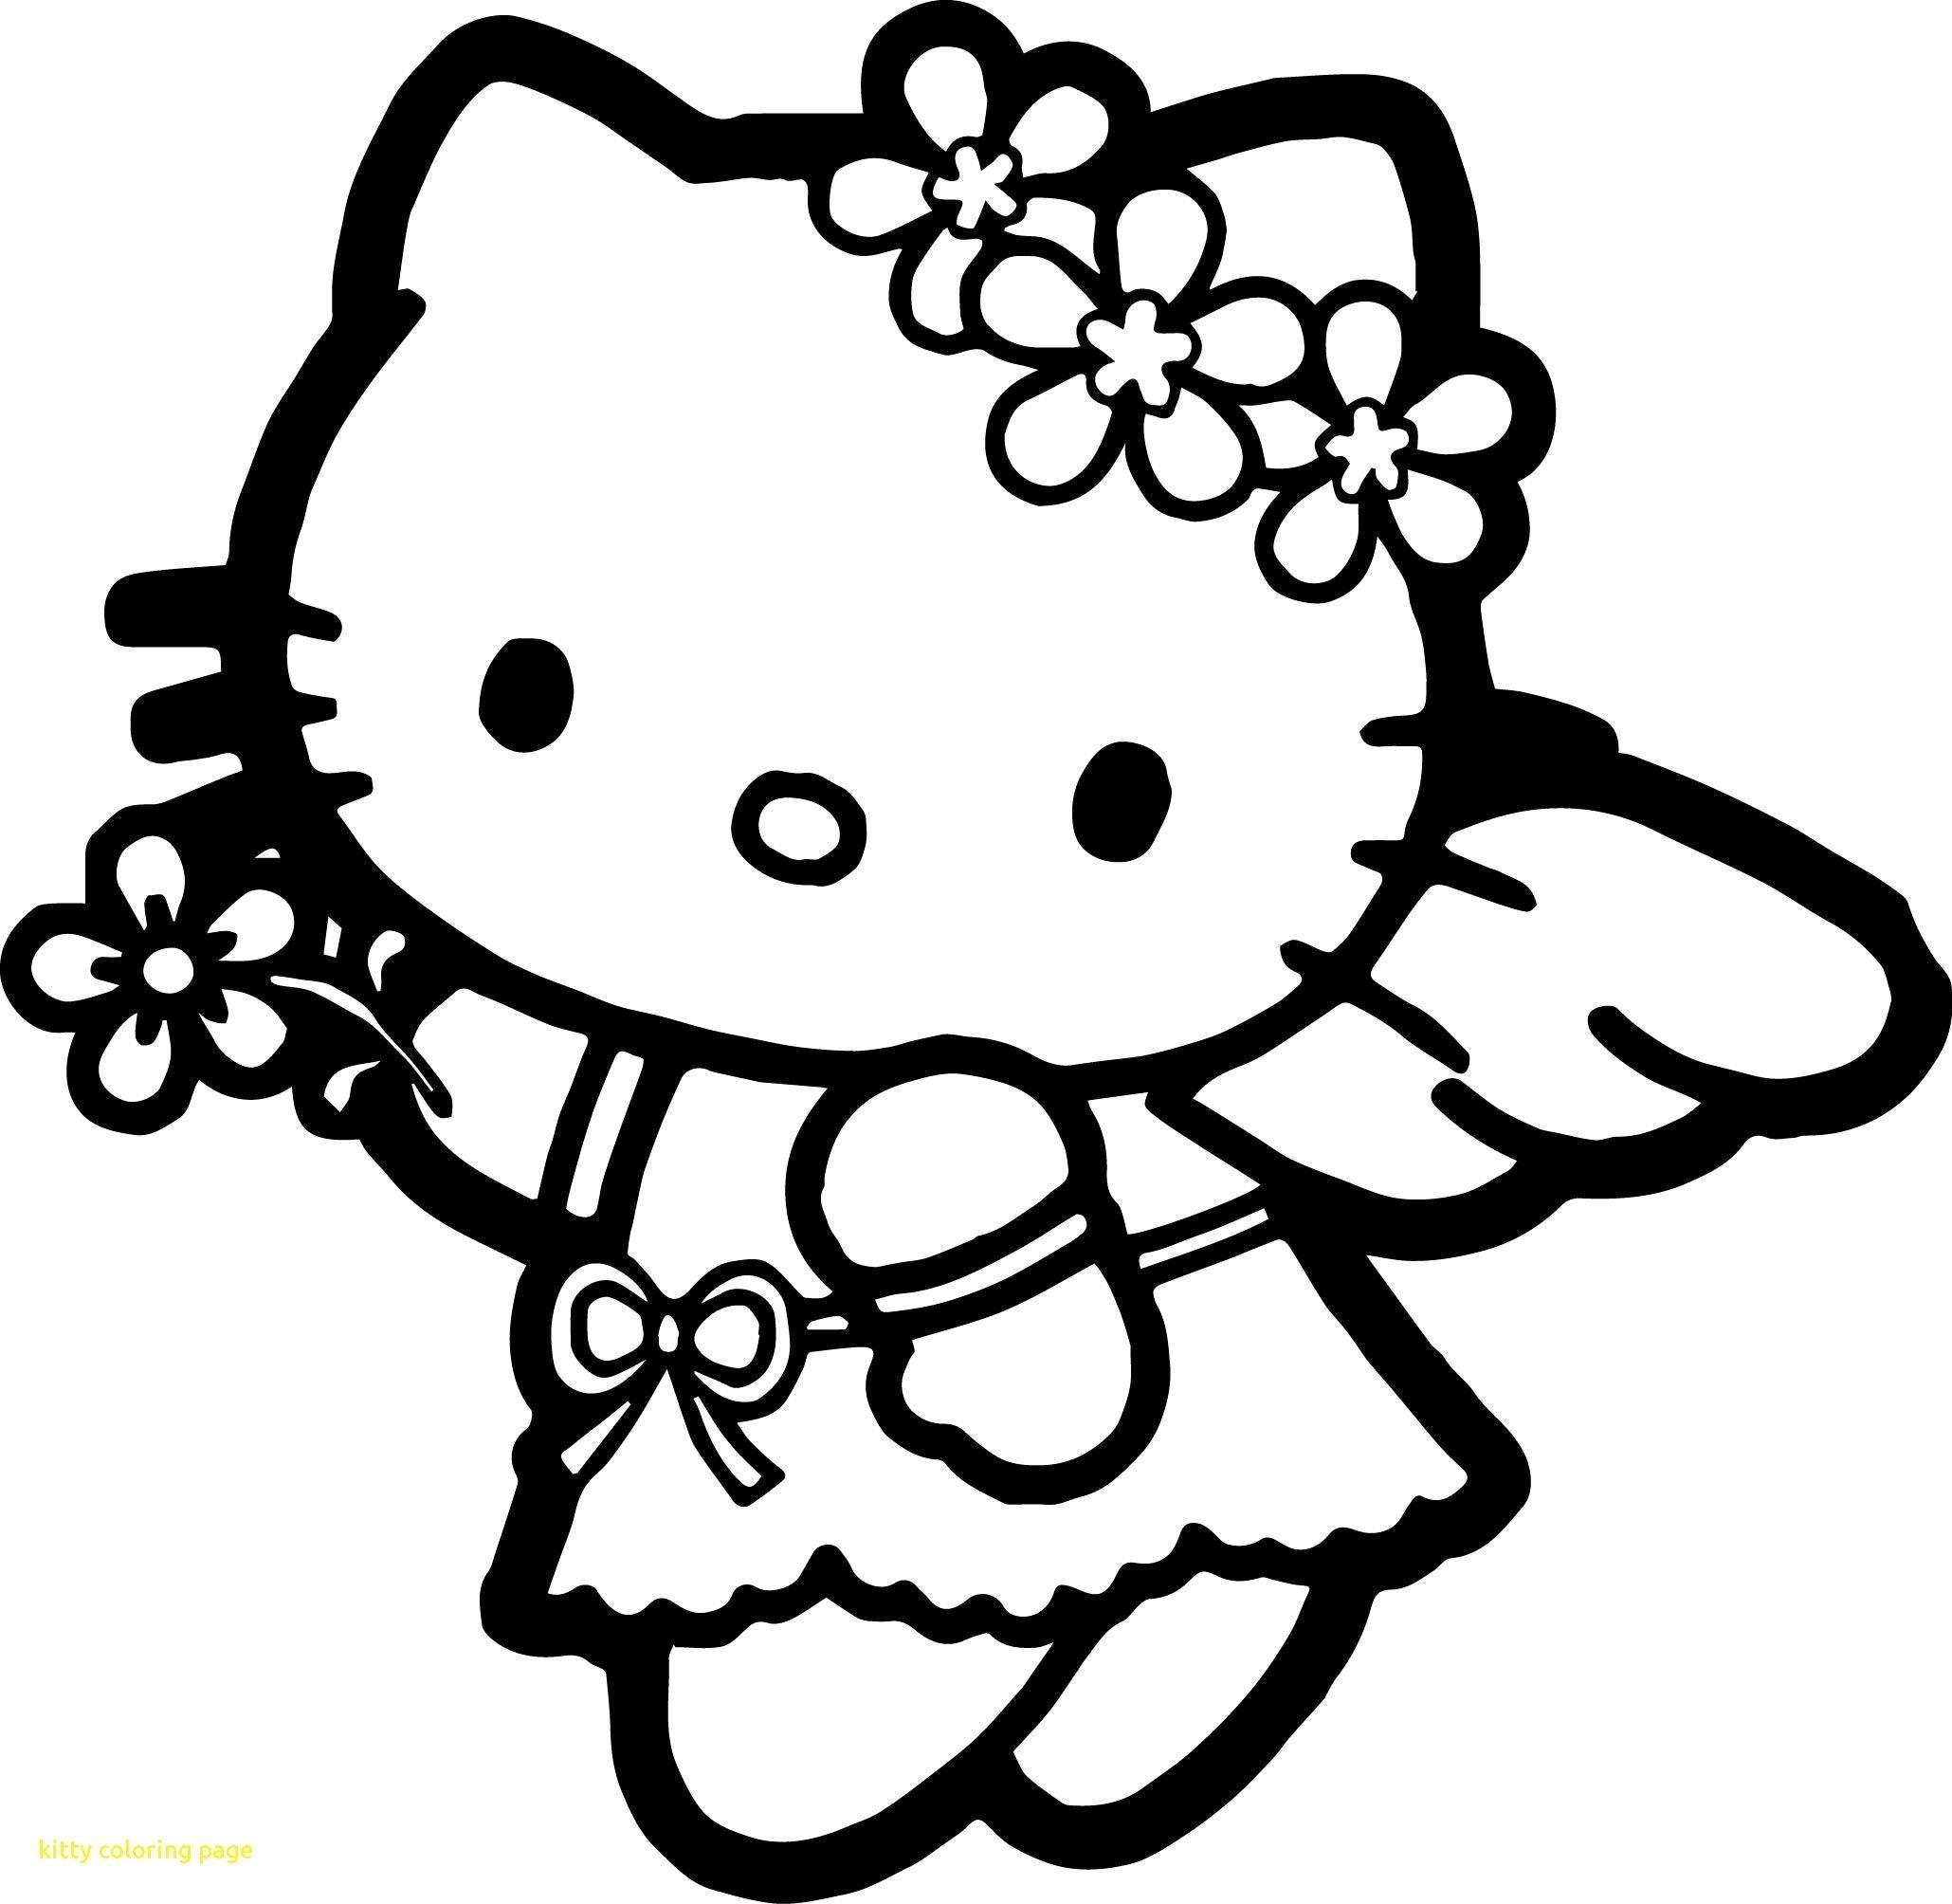 Hello Kitty Coloring Book Free Download Hello Kitty Coloring Book Free Download Ideya Tatuirovki Eskiz Eskiz Tatu